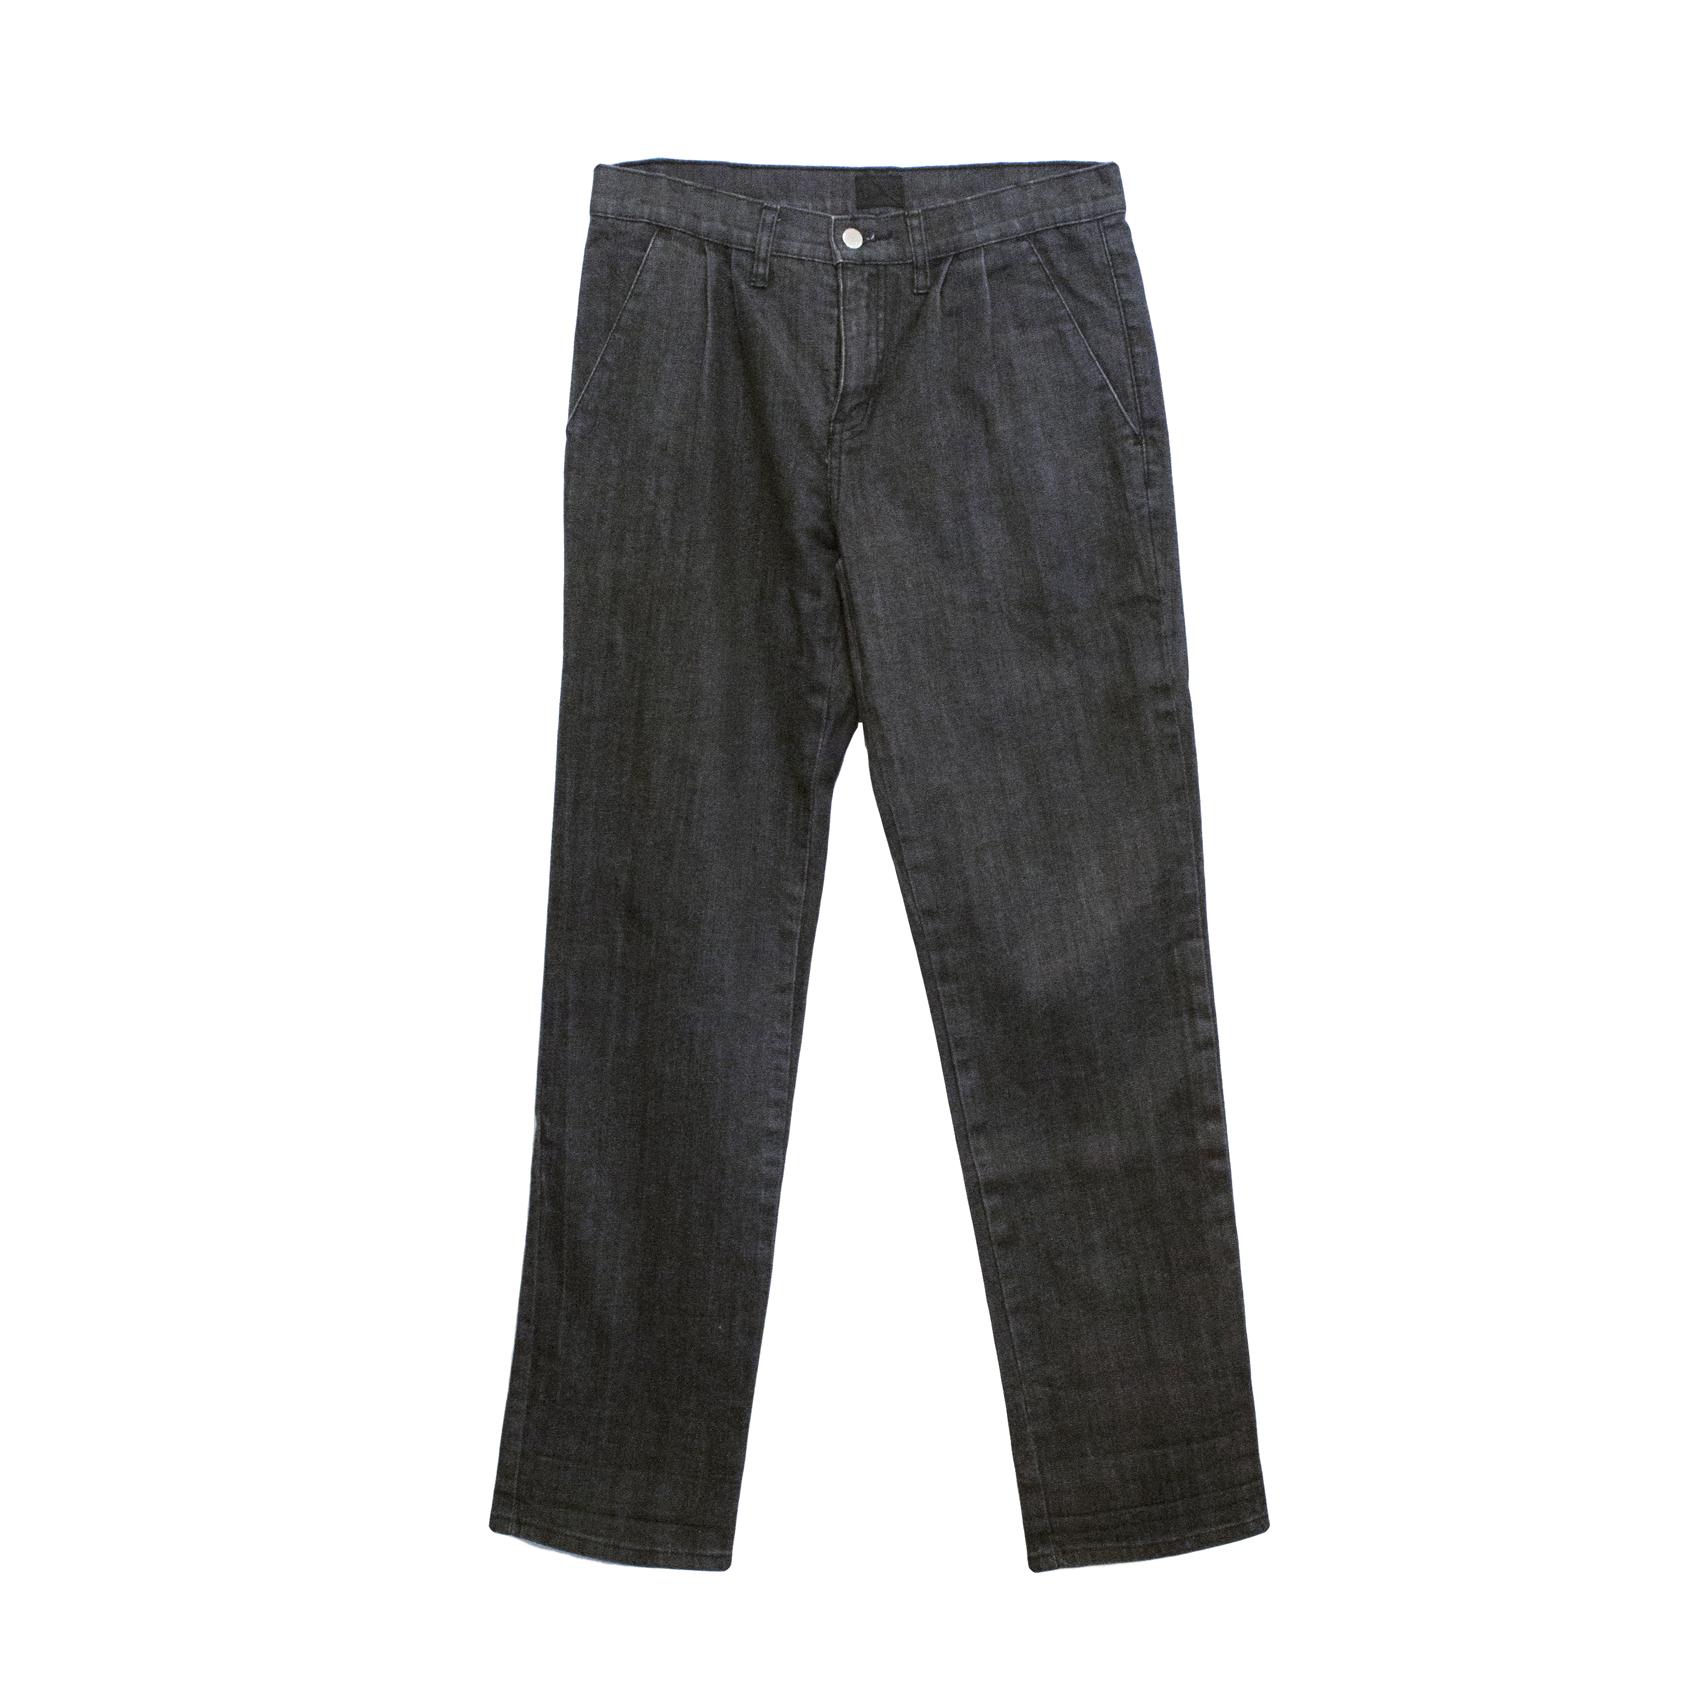 B store straight cut jeans